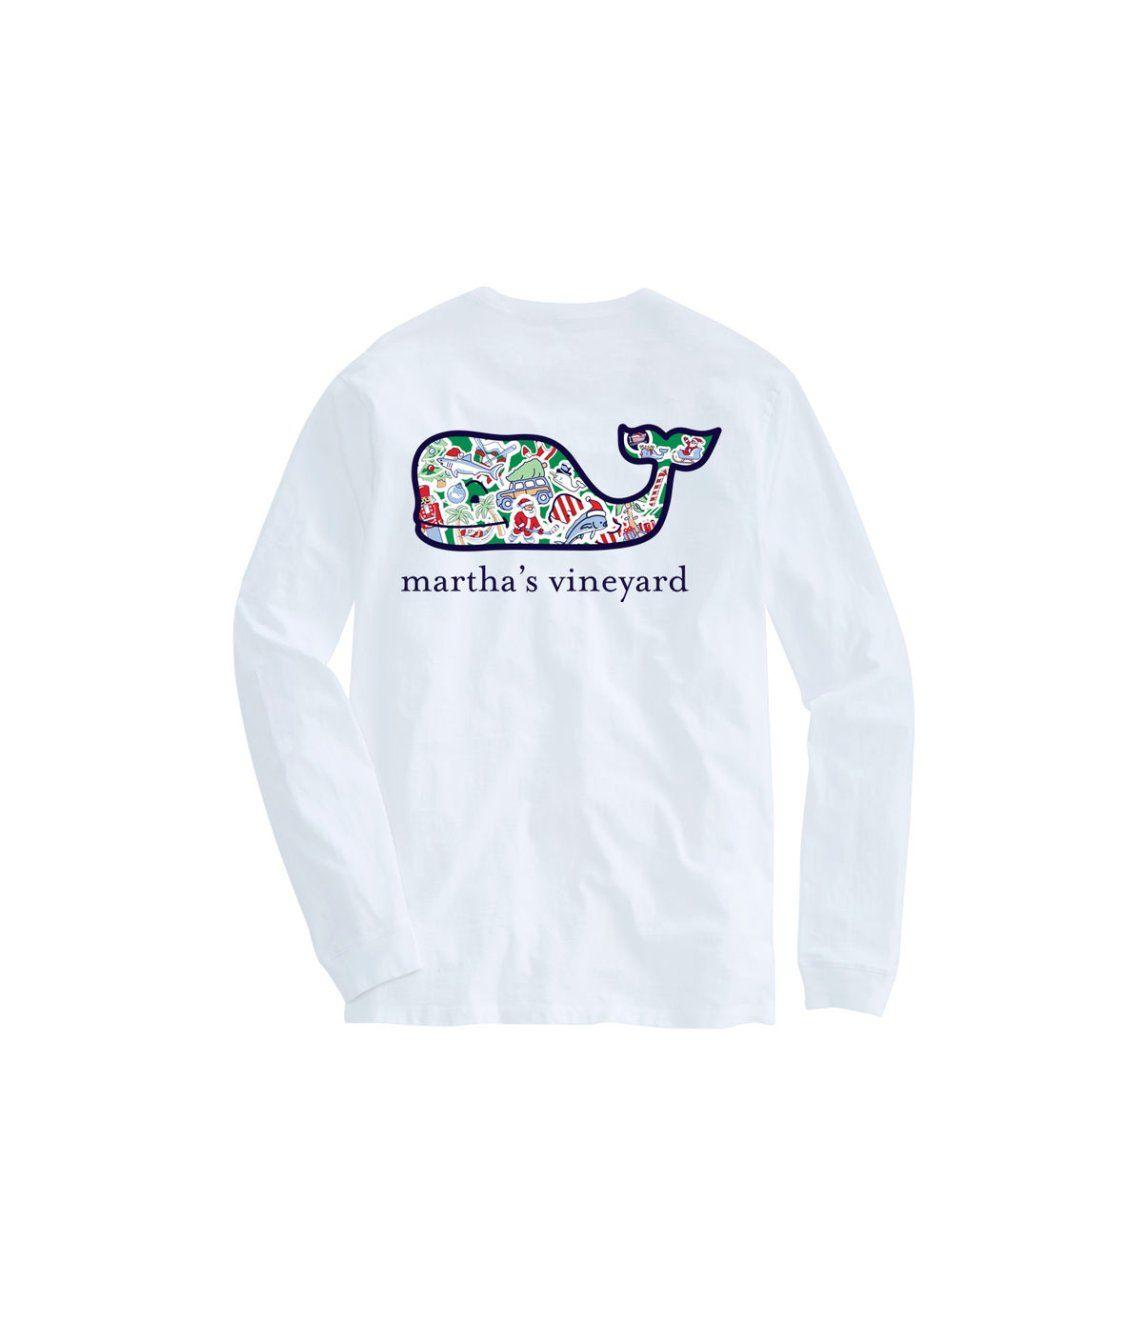 Vineyard Vines Christmas Shirt 2019.Martha S Vineyard Long Sleeve Whale Christmas Icon T Shirt